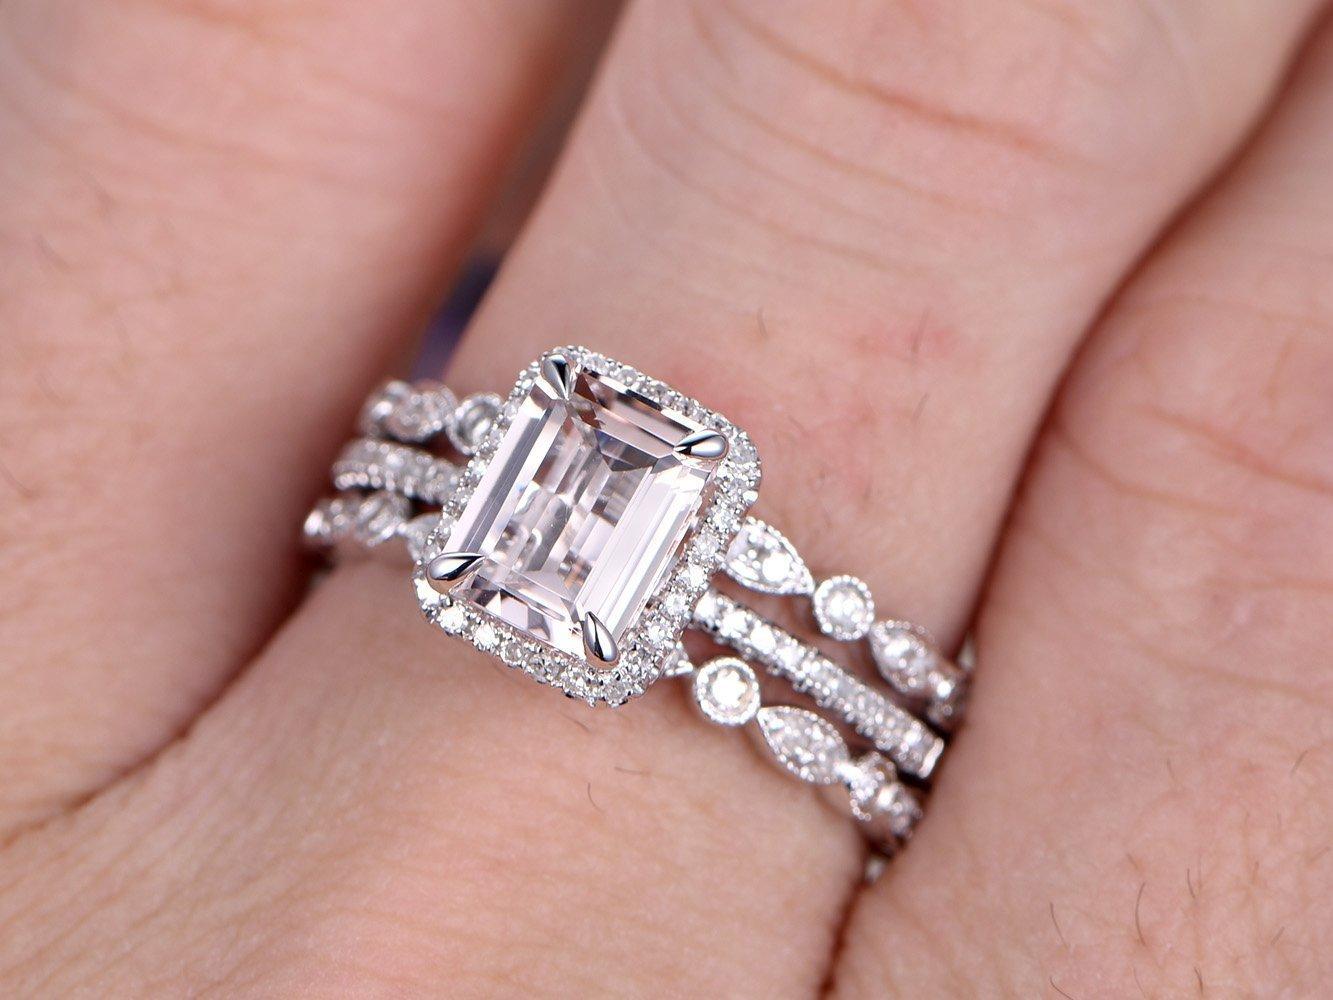 Amazon.com: Morganite Wedding Ring Set Solid 14k White Gold 6x8mm ...